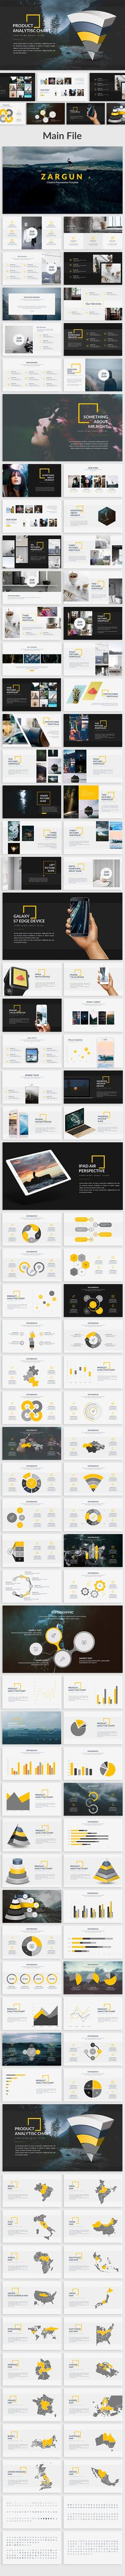 Zargun - Creative Powerpoint Template - Creative #PowerPoint #Templates Download here:  https://graphicriver.net/item/zargun-creative-powerpoint-template/19520153?ref=alena994